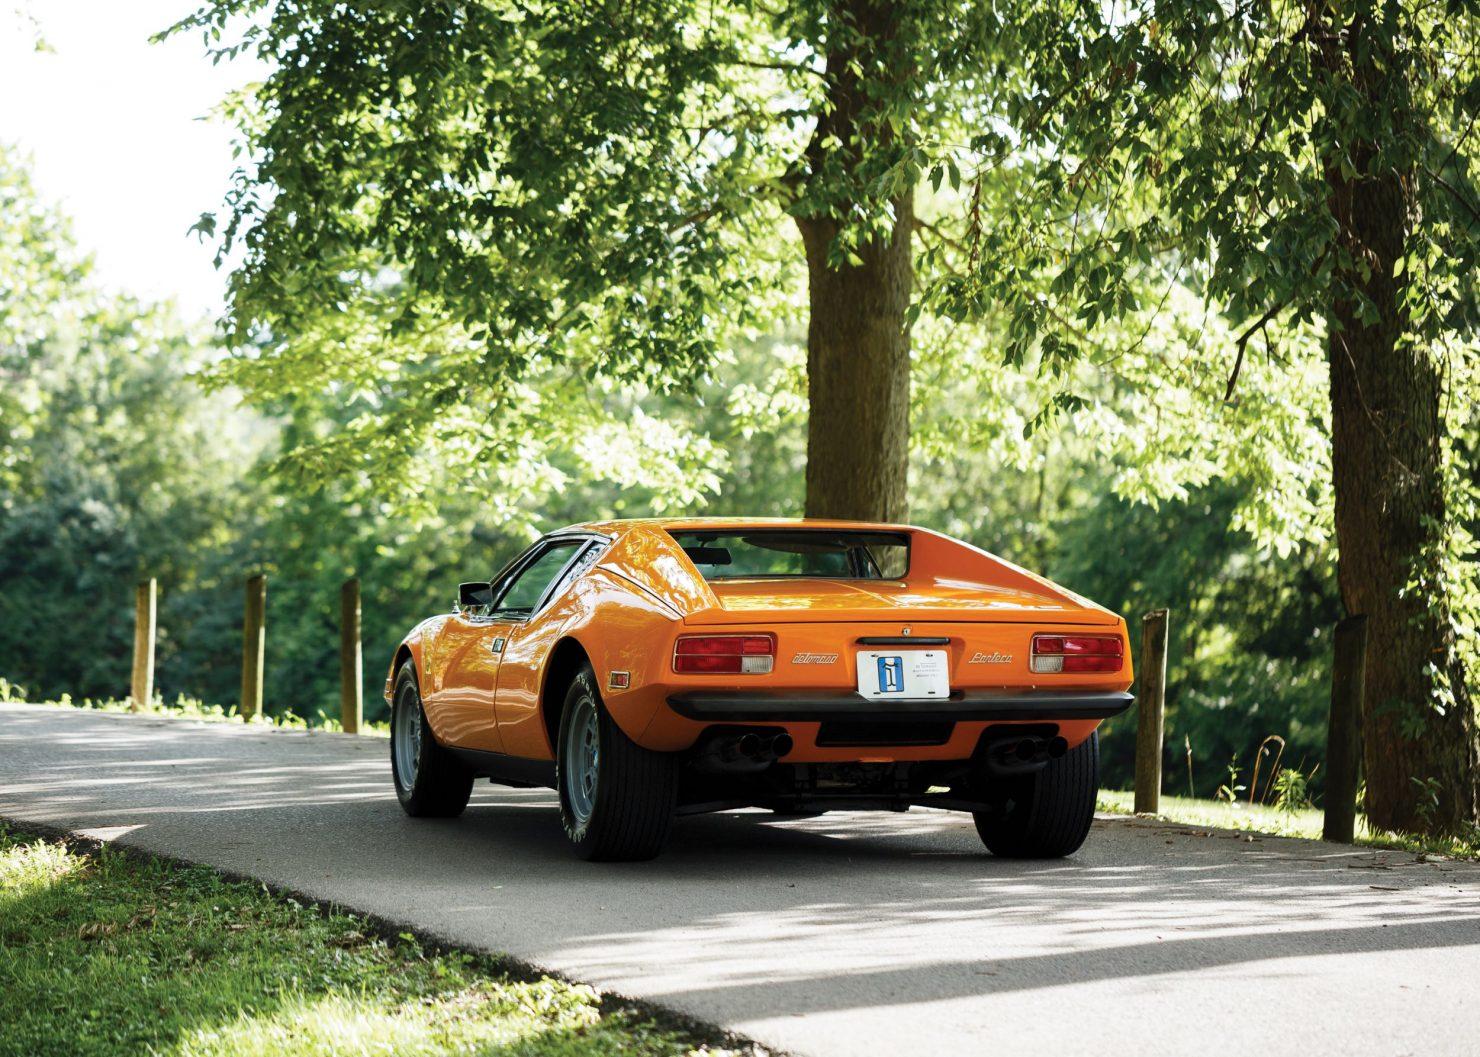 de tomaso pantera 2 1480x1057 - The Last American De Tomaso Pantera